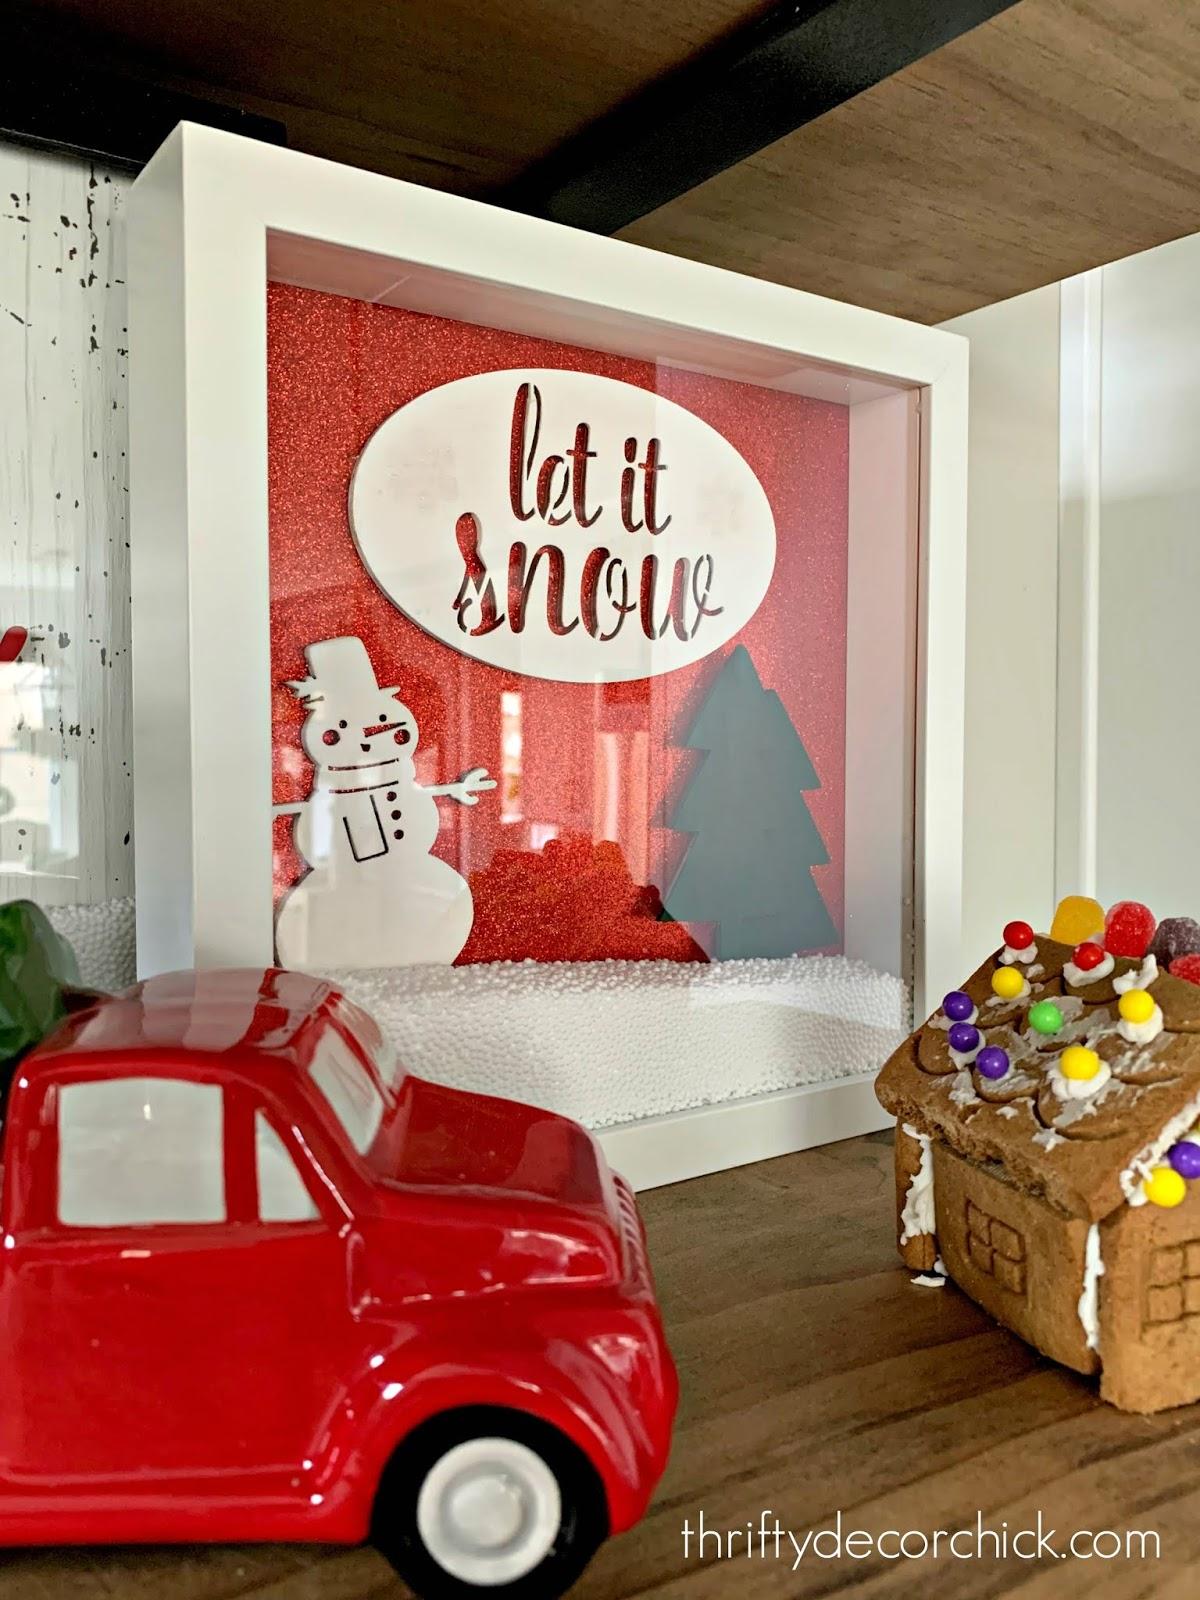 Making snowglobe art in frame